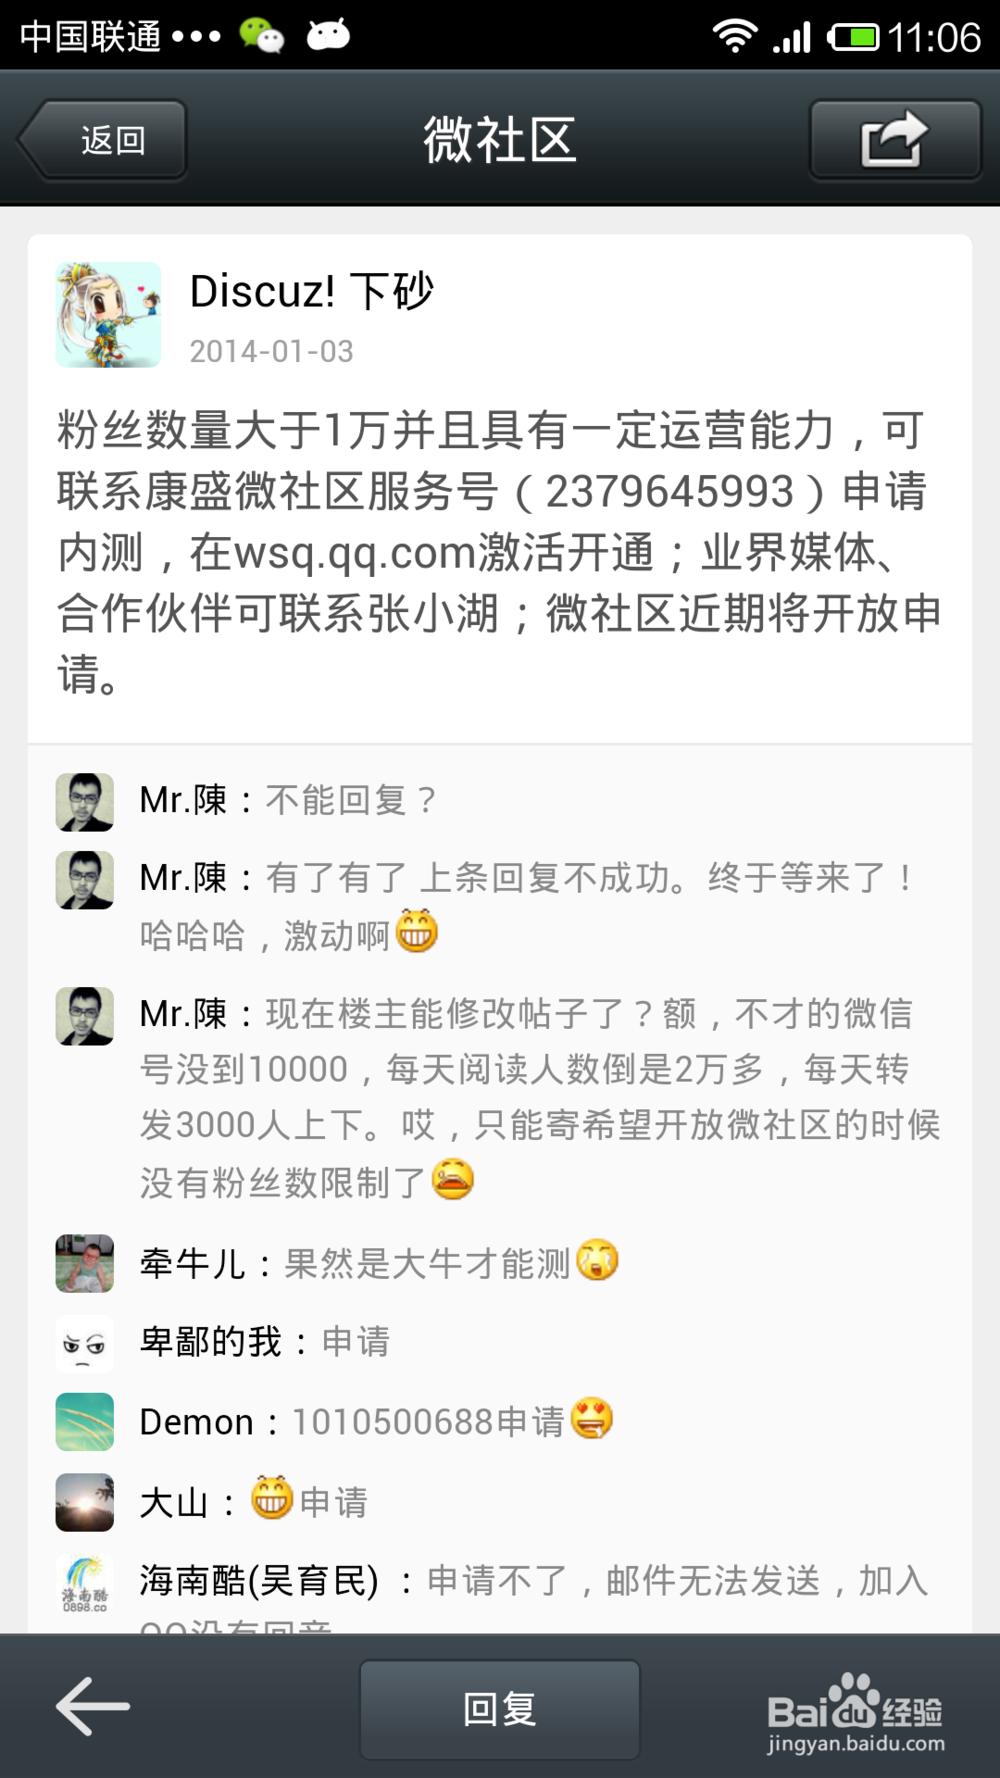 bbs论坛_在微社区的论坛里面我们可以看到很多的微社区消息,不断的去更新和去